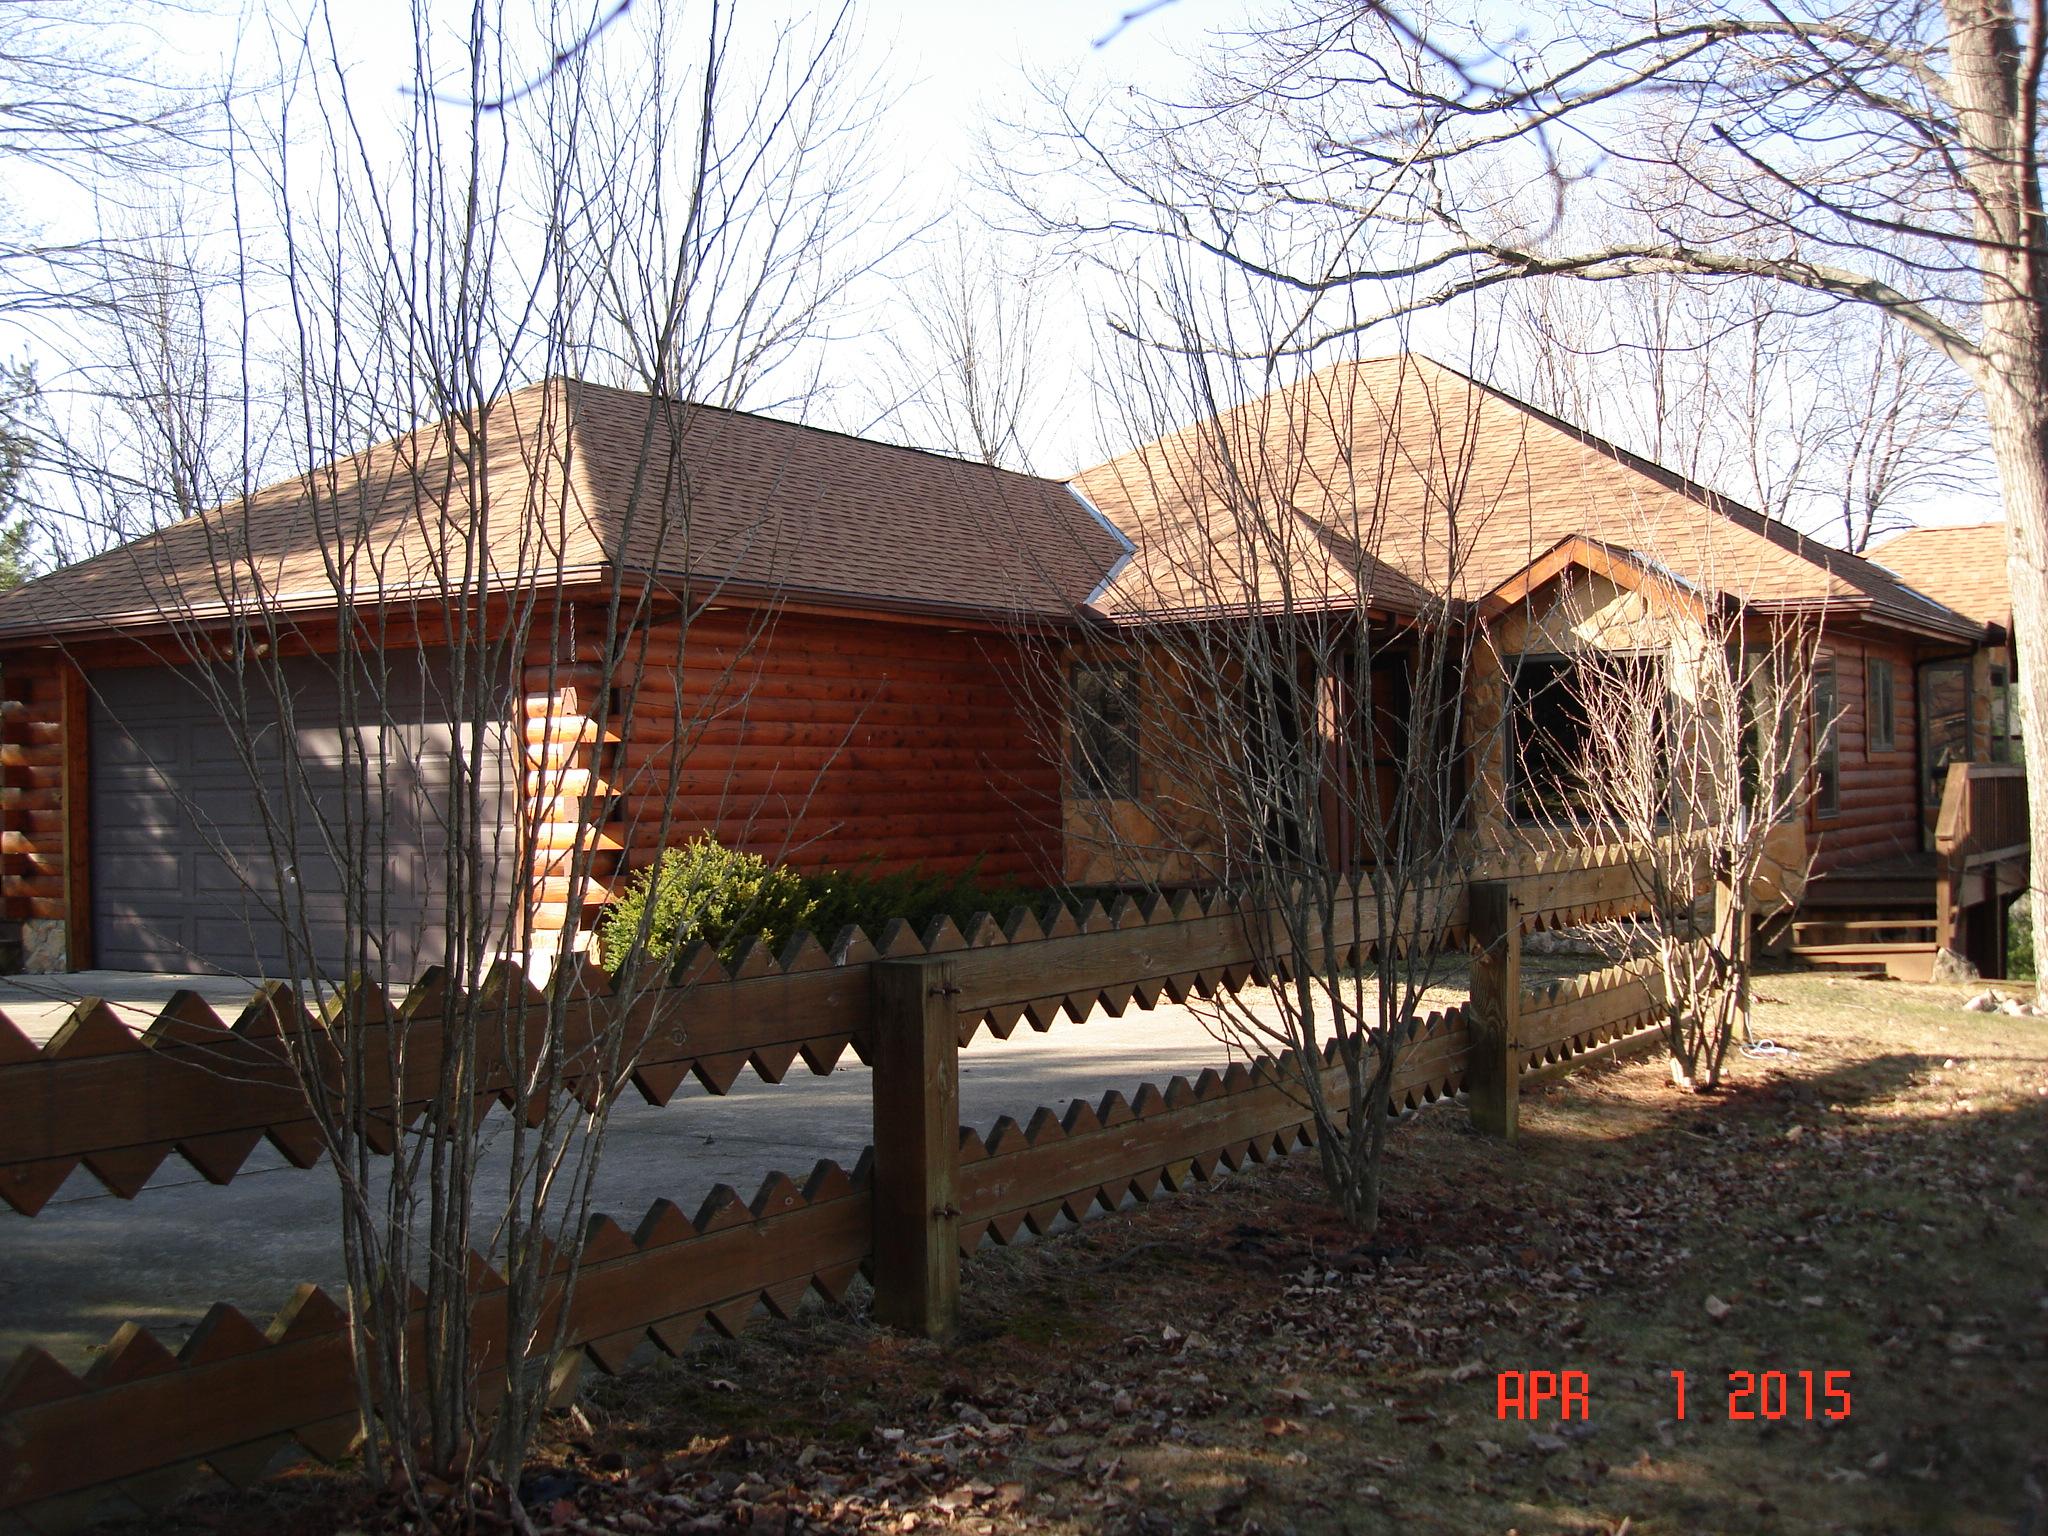 7326 St. Rt. 19, Mt. Gilead, Ohio 43338